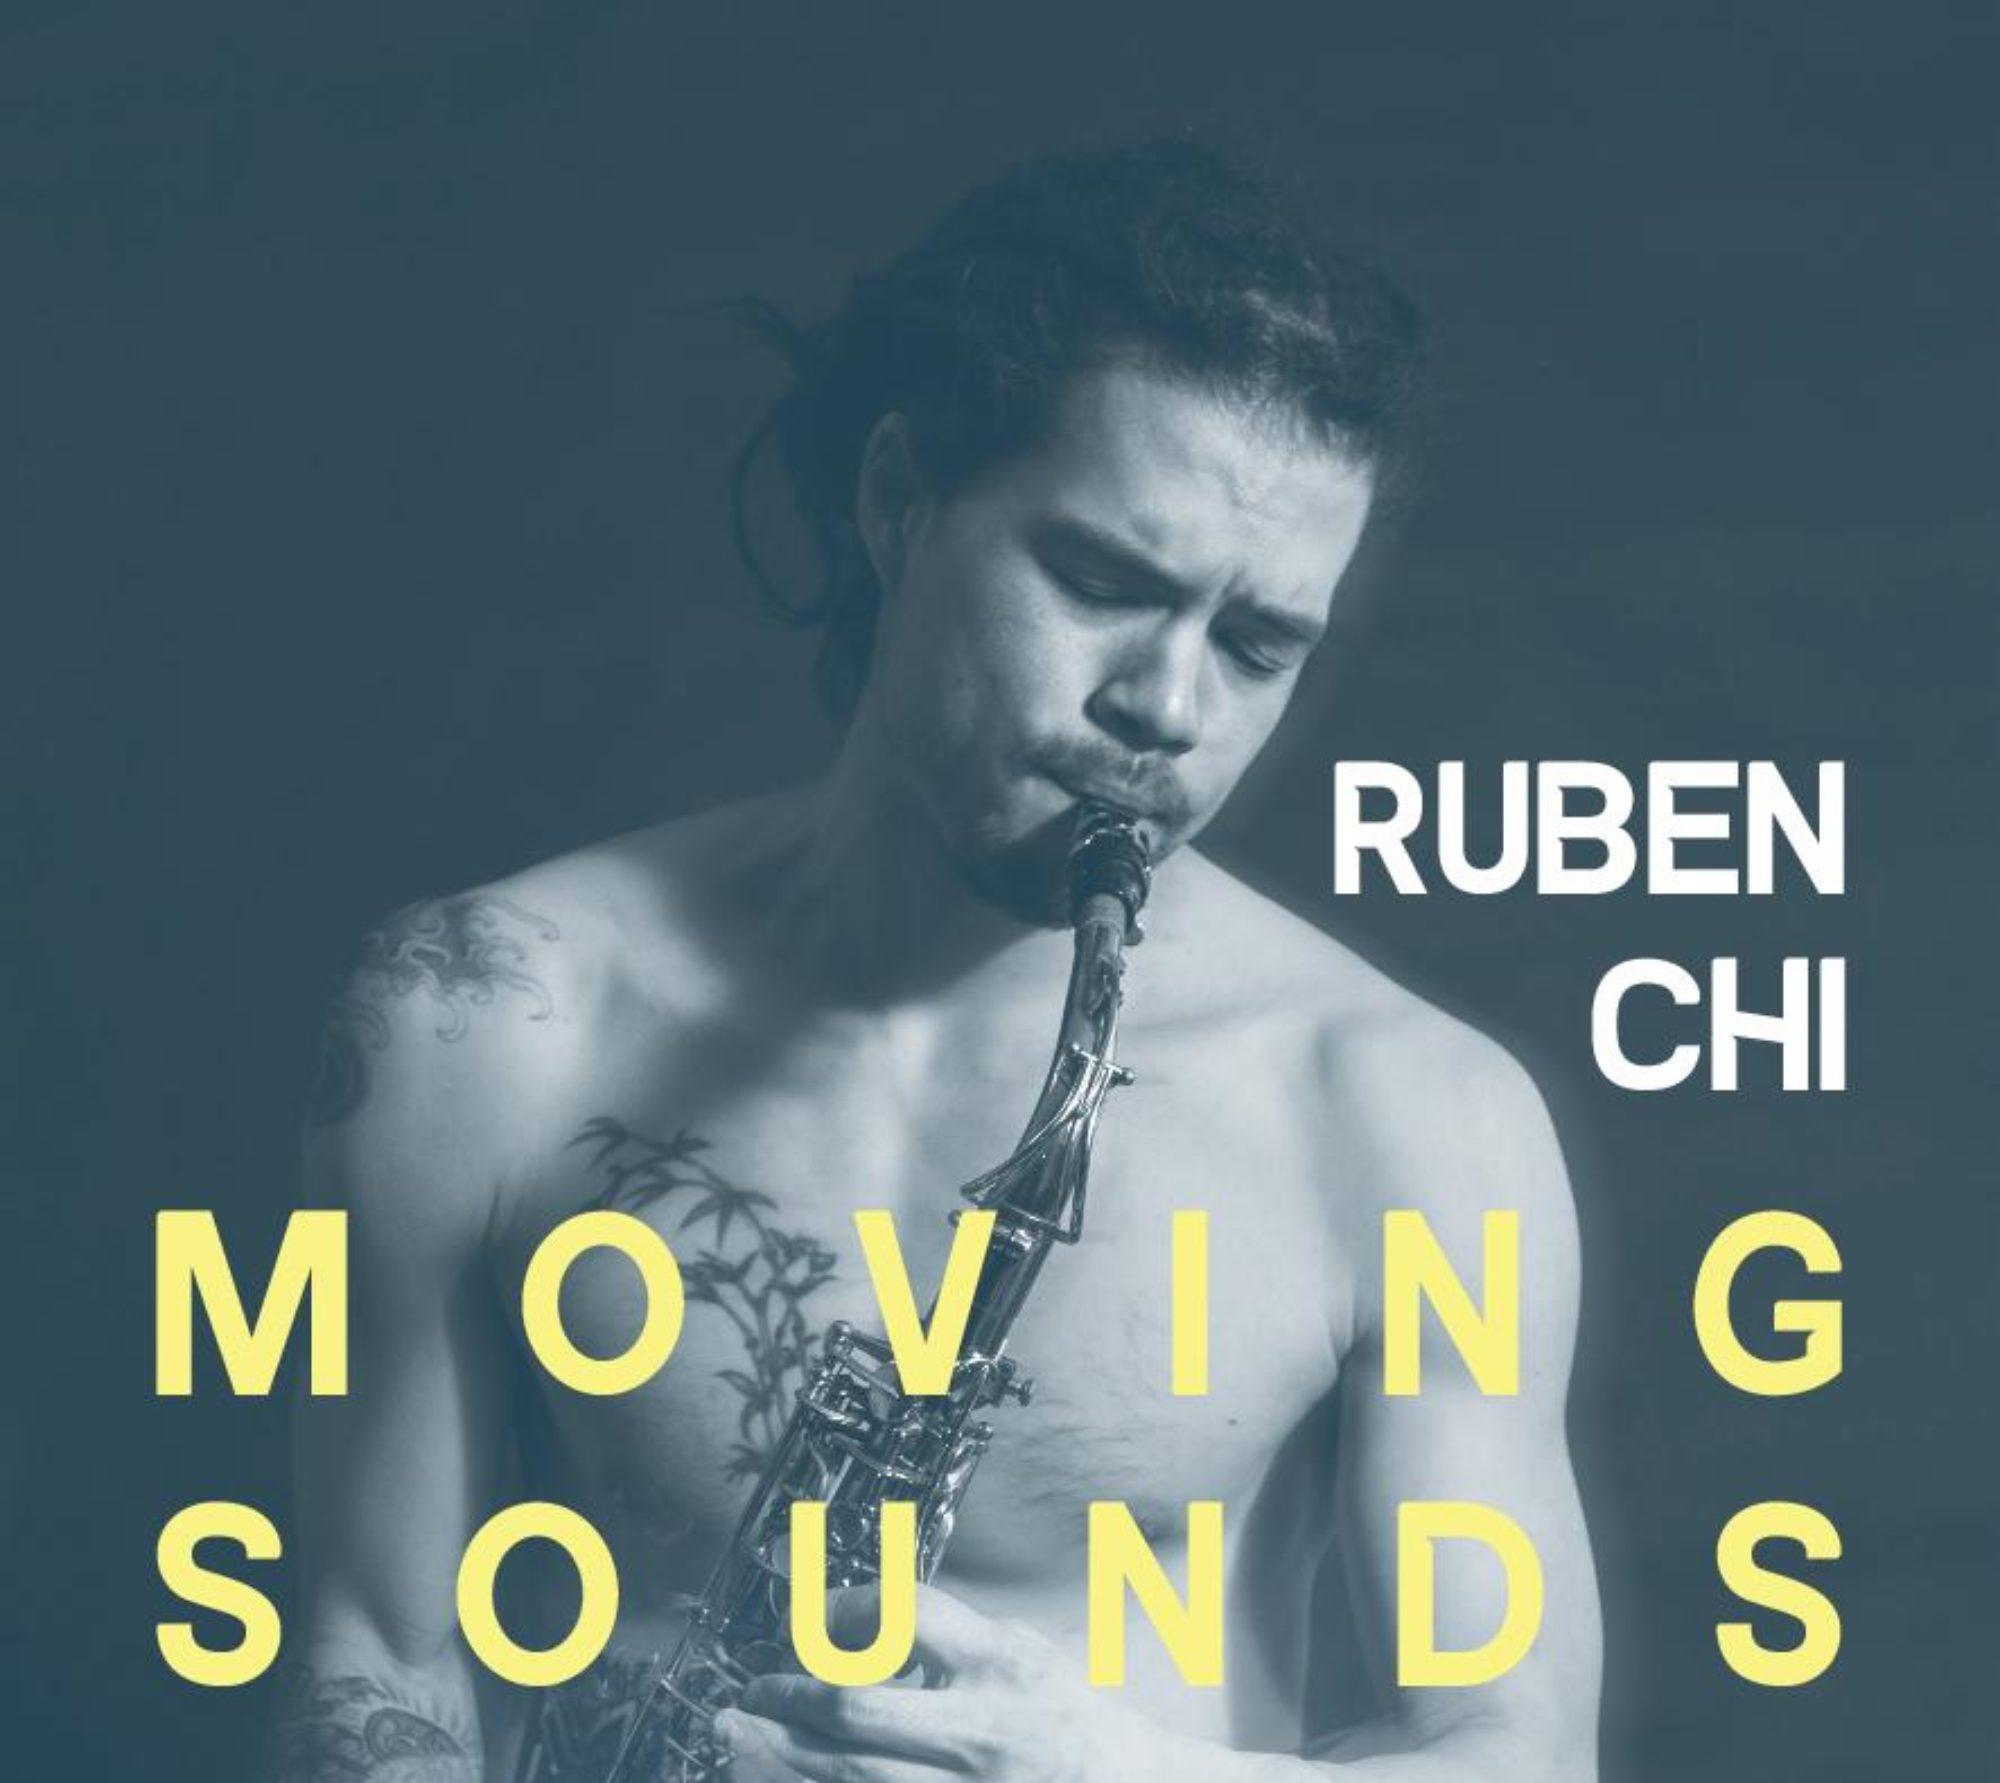 RUBEN CHI